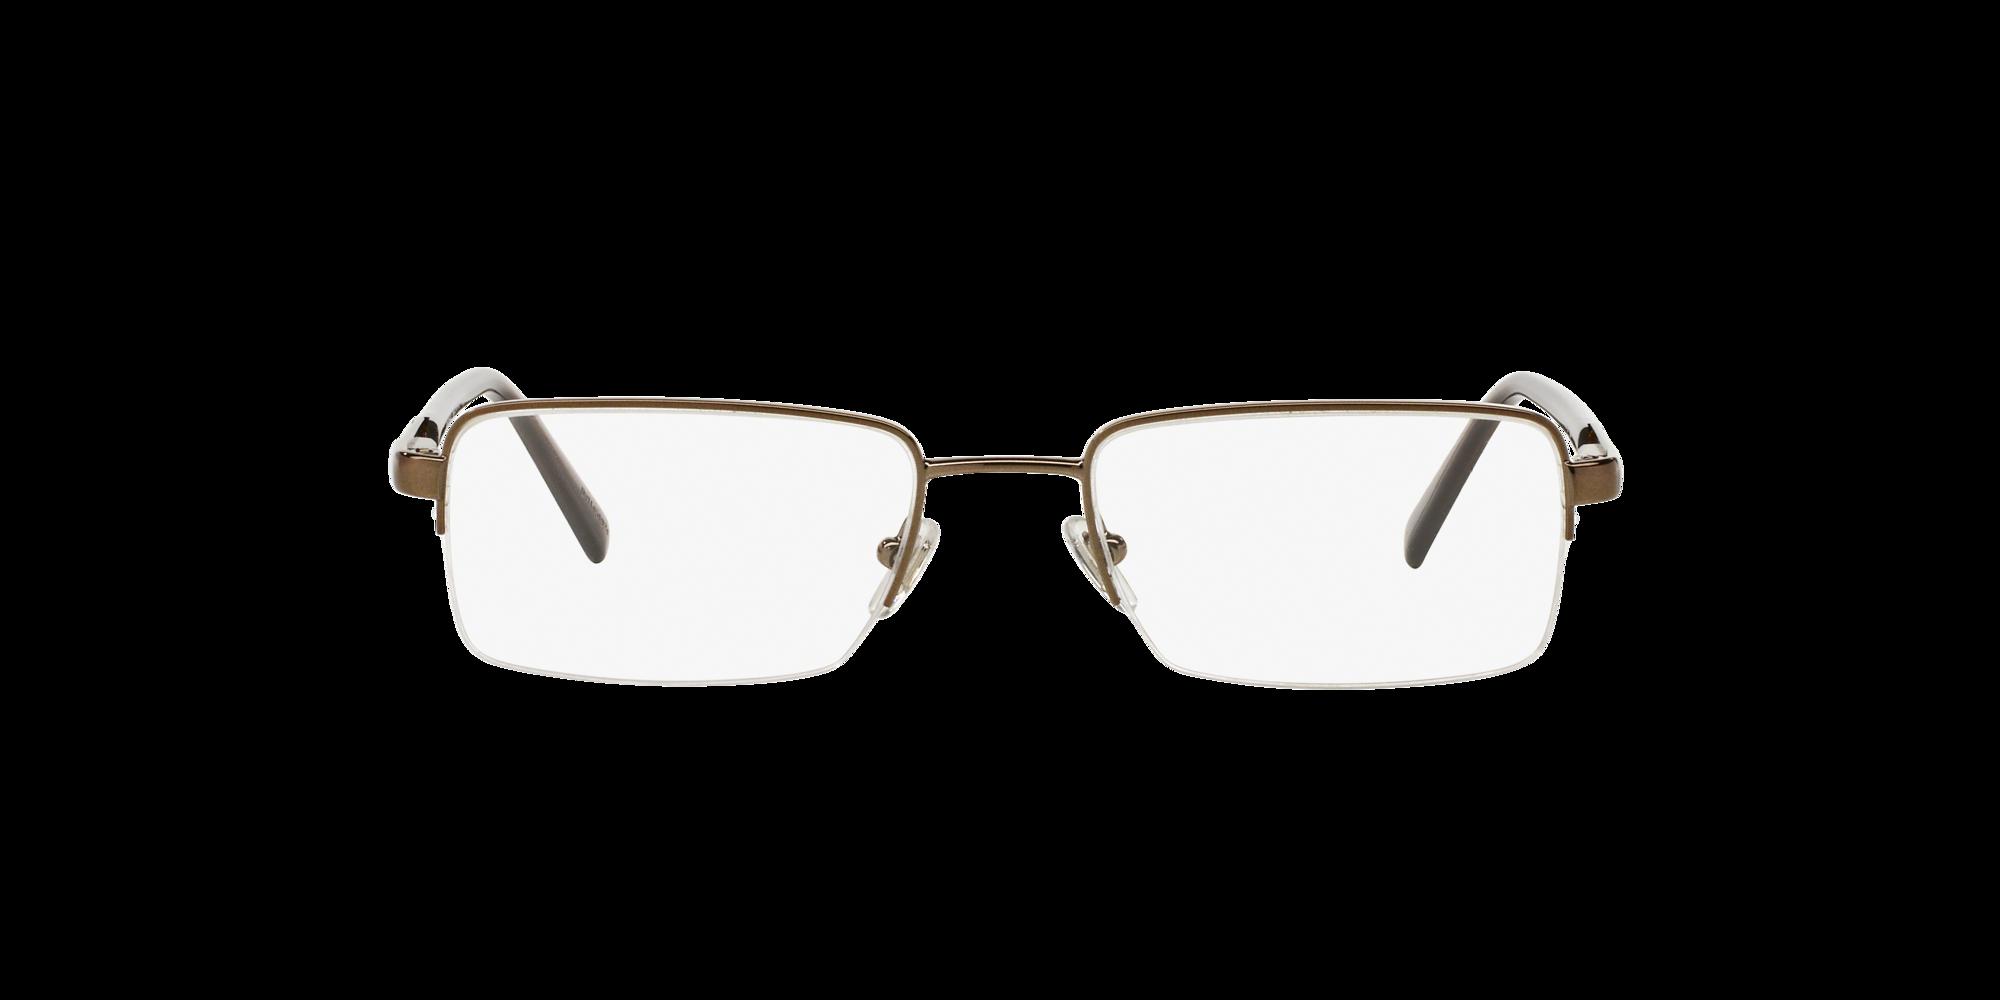 Image for VE1066 from LensCrafters | Glasses, Prescription Glasses Online, Eyewear